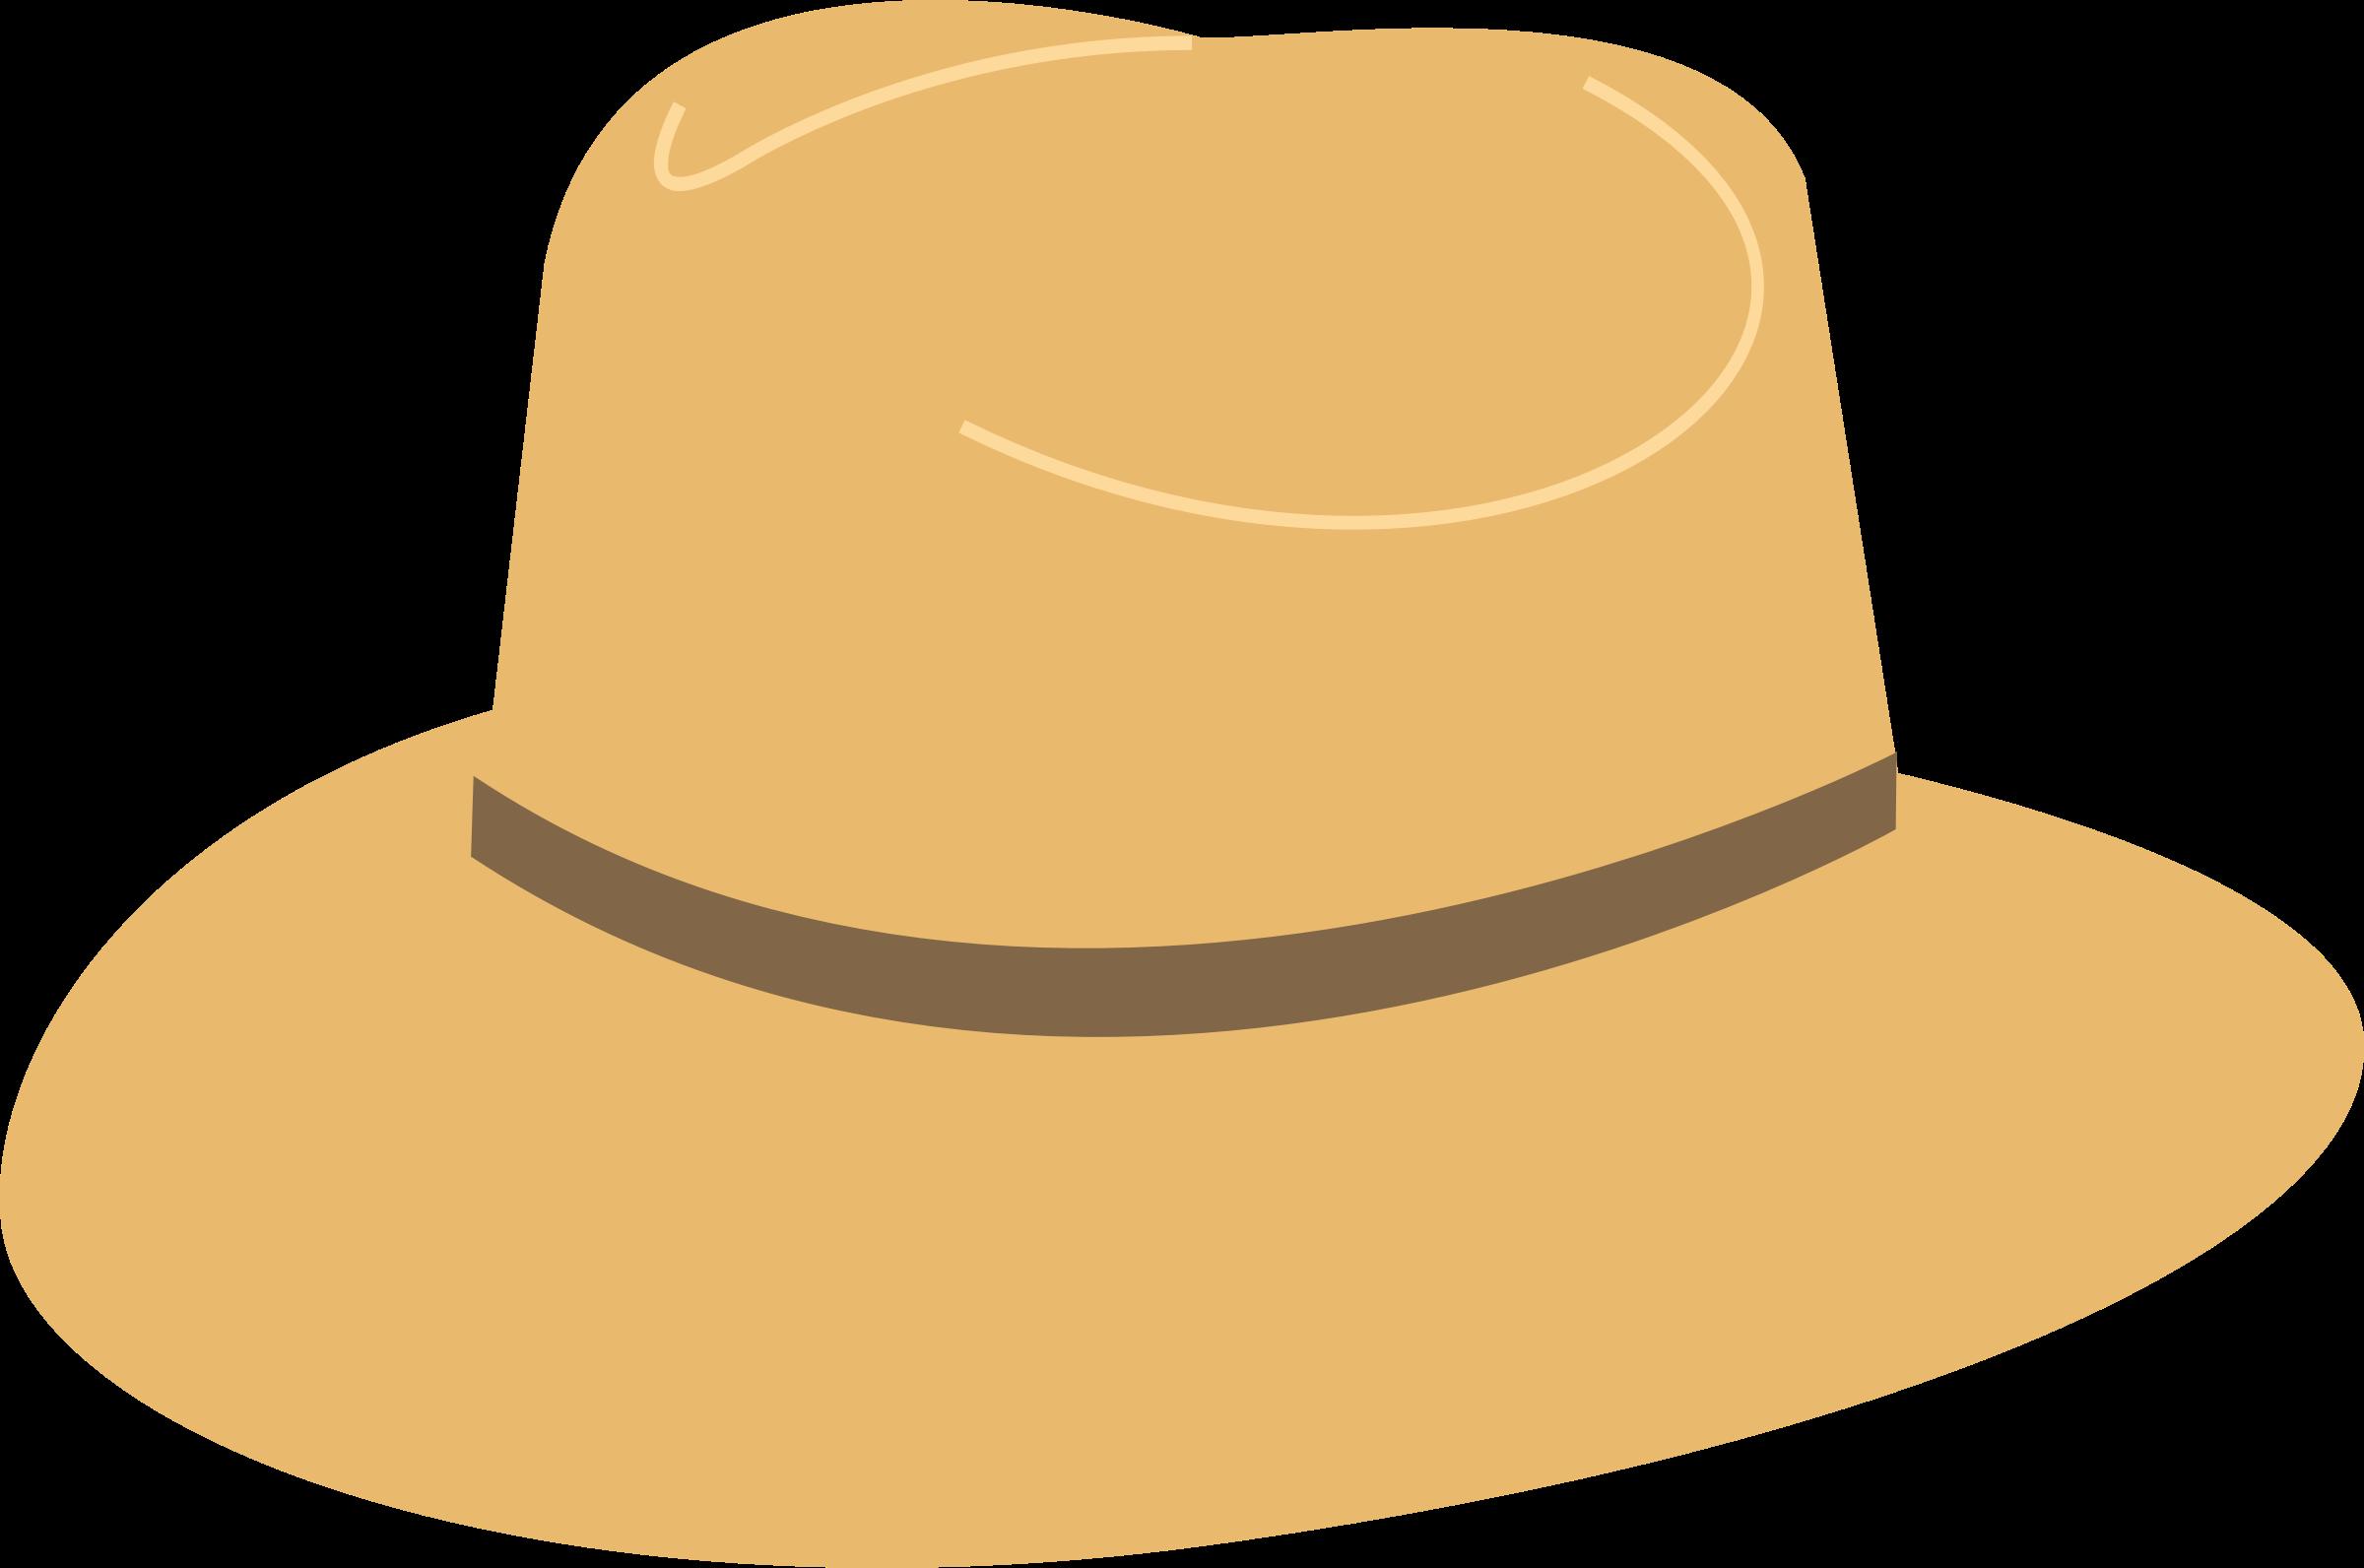 Clipart hat vector. Sun